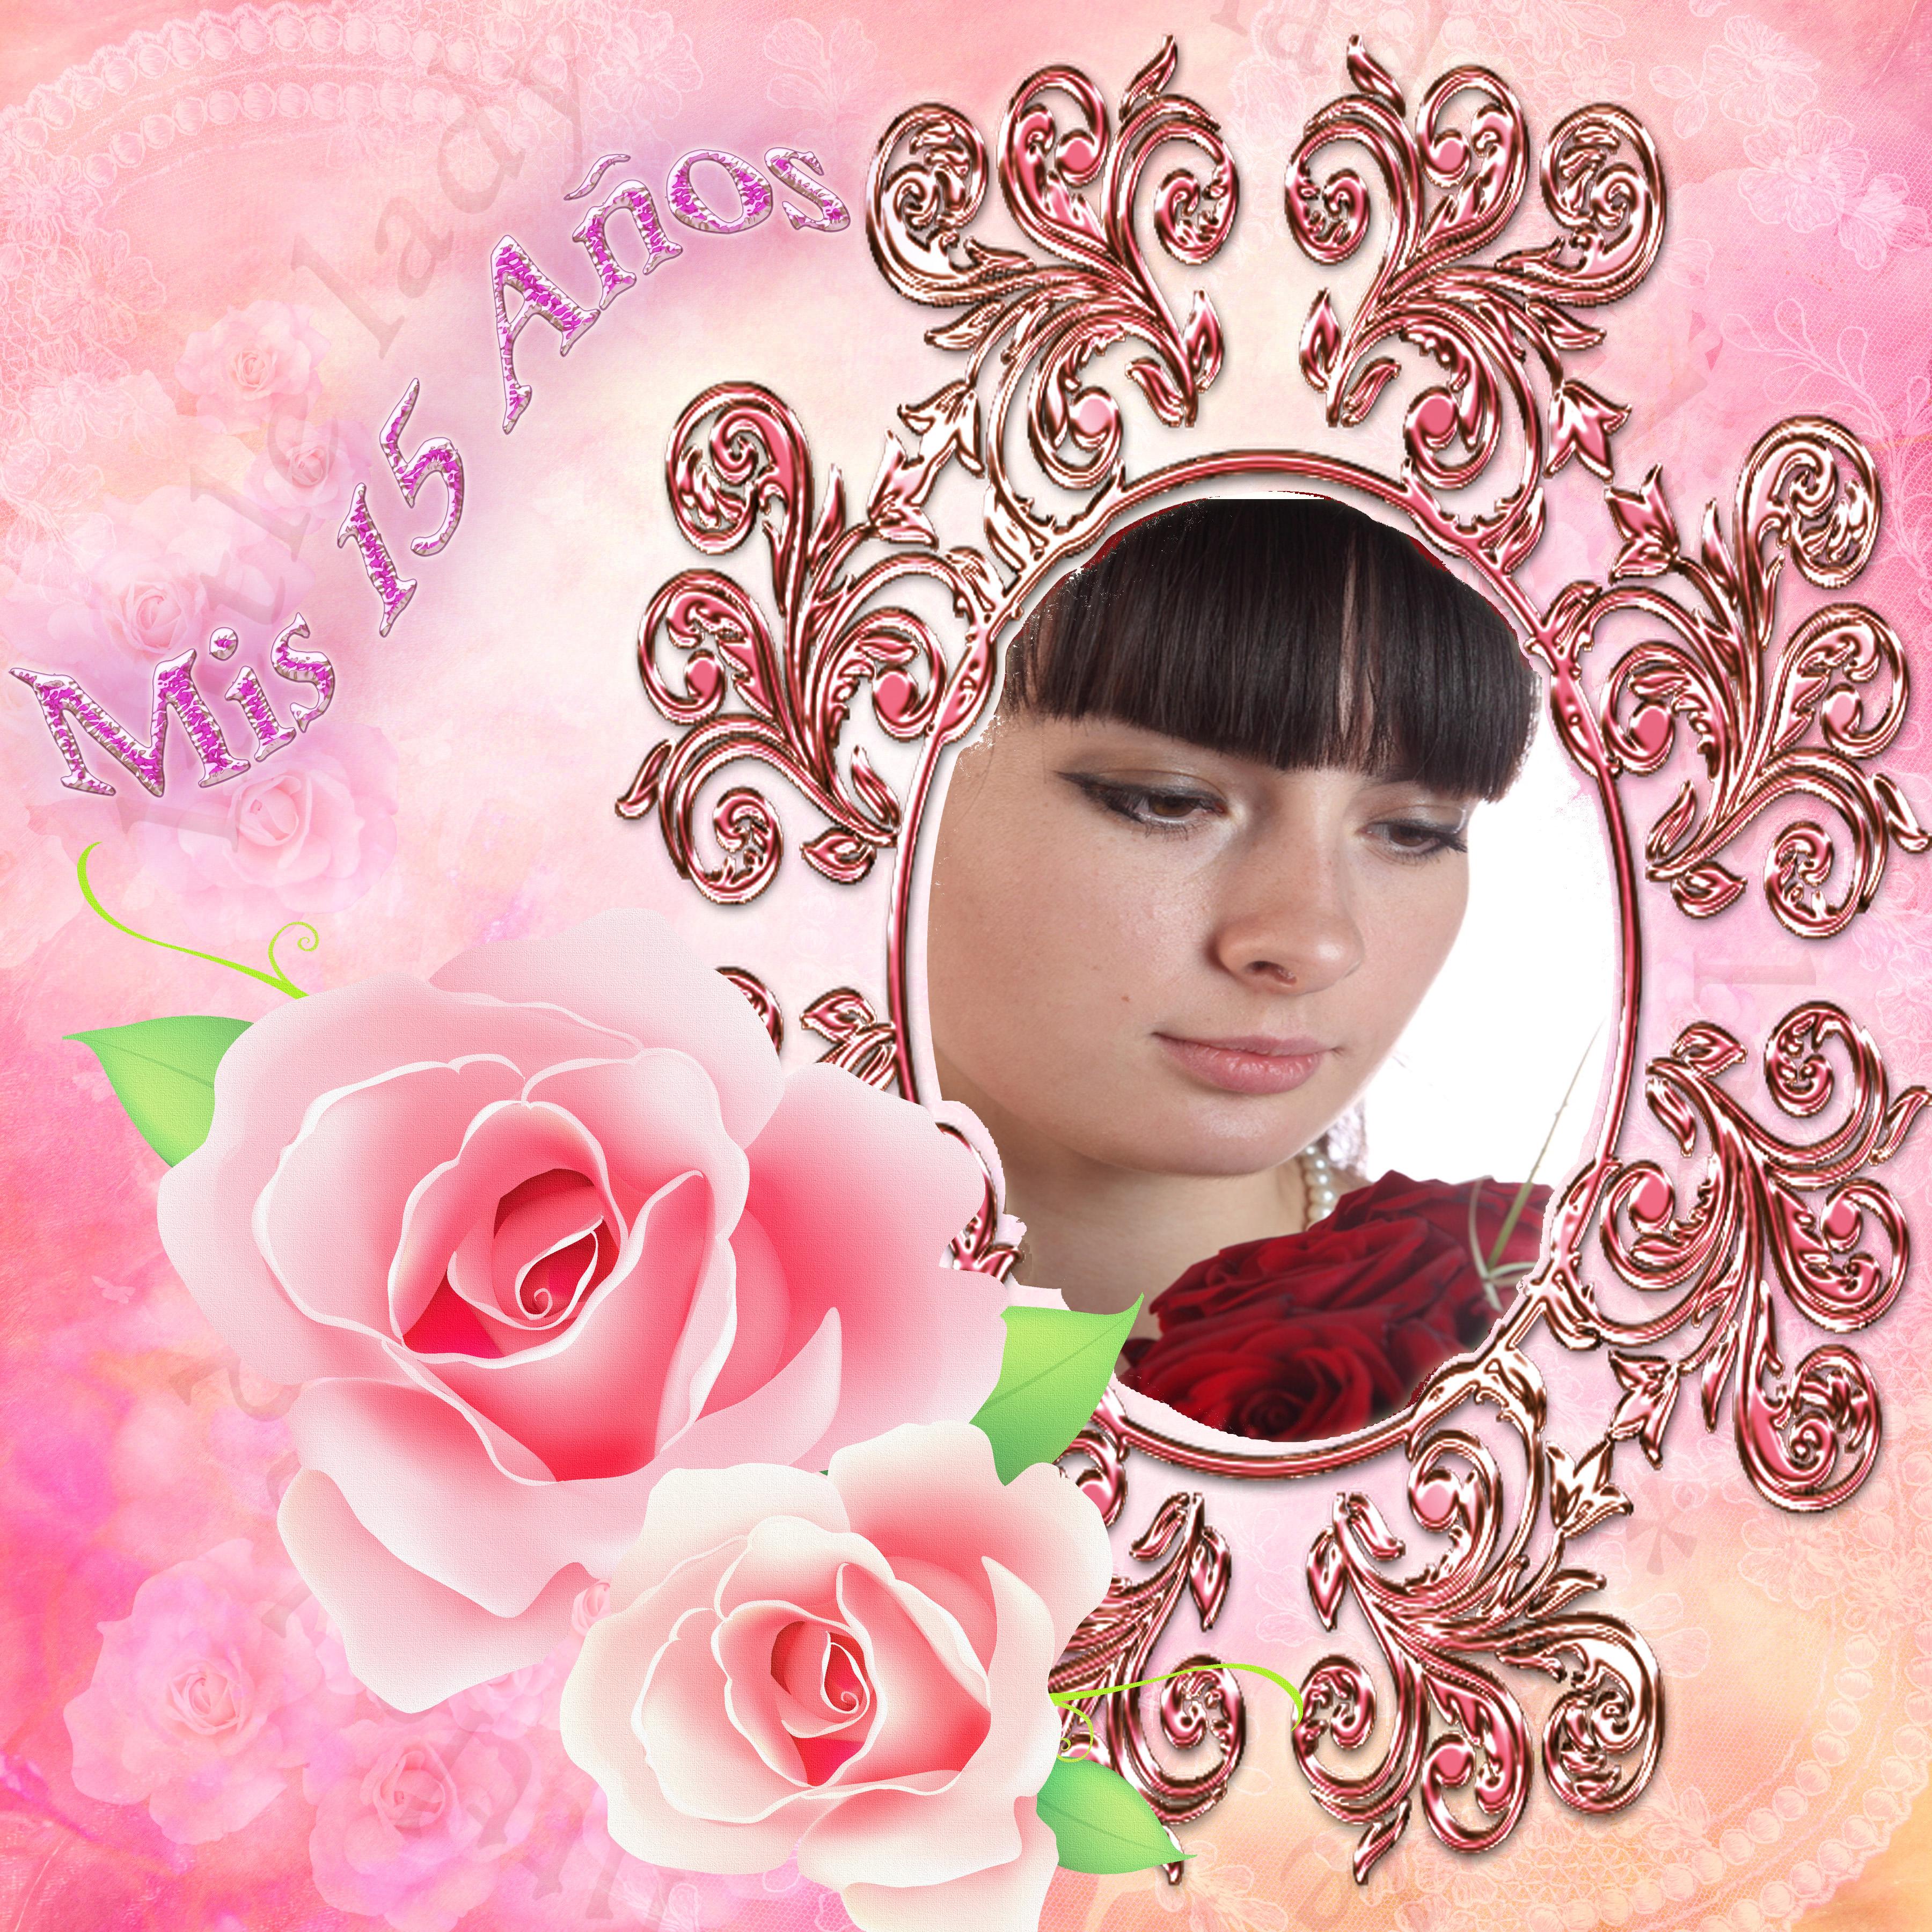 Nozomi Kurahashi 7 Years Old